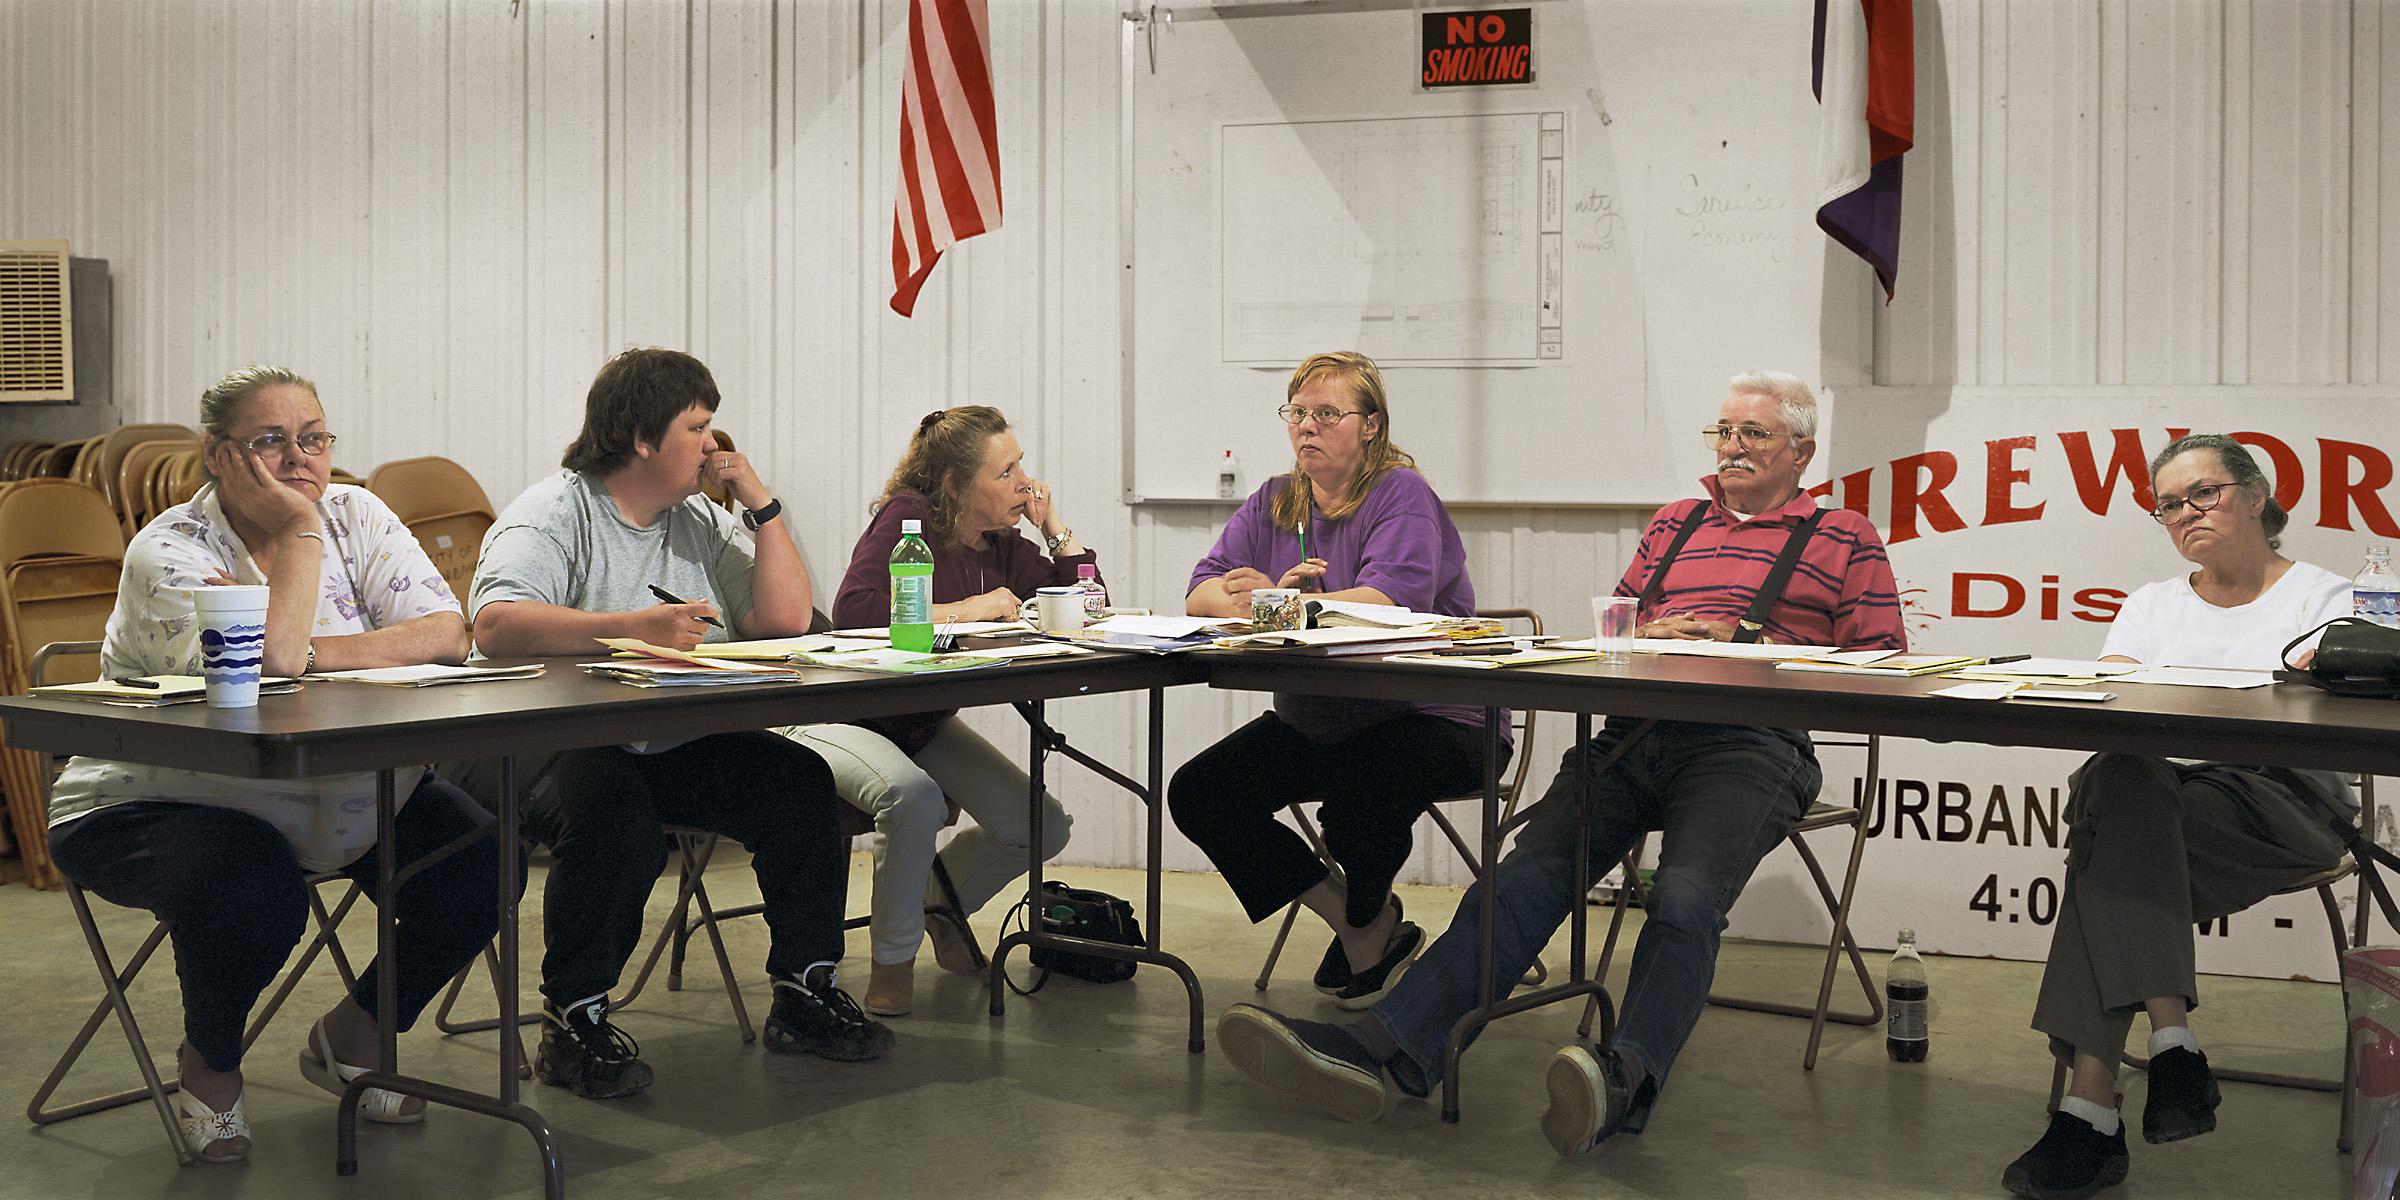 Urbana, Missouri (population 360) City Council, May 22, 2002 (L to R): Laura Hancock, Debra Glass, Teddy Hawthorne (City Clerk), Lynn Bailey (Mayor), George Meek, Lyn Kamien, 2002.